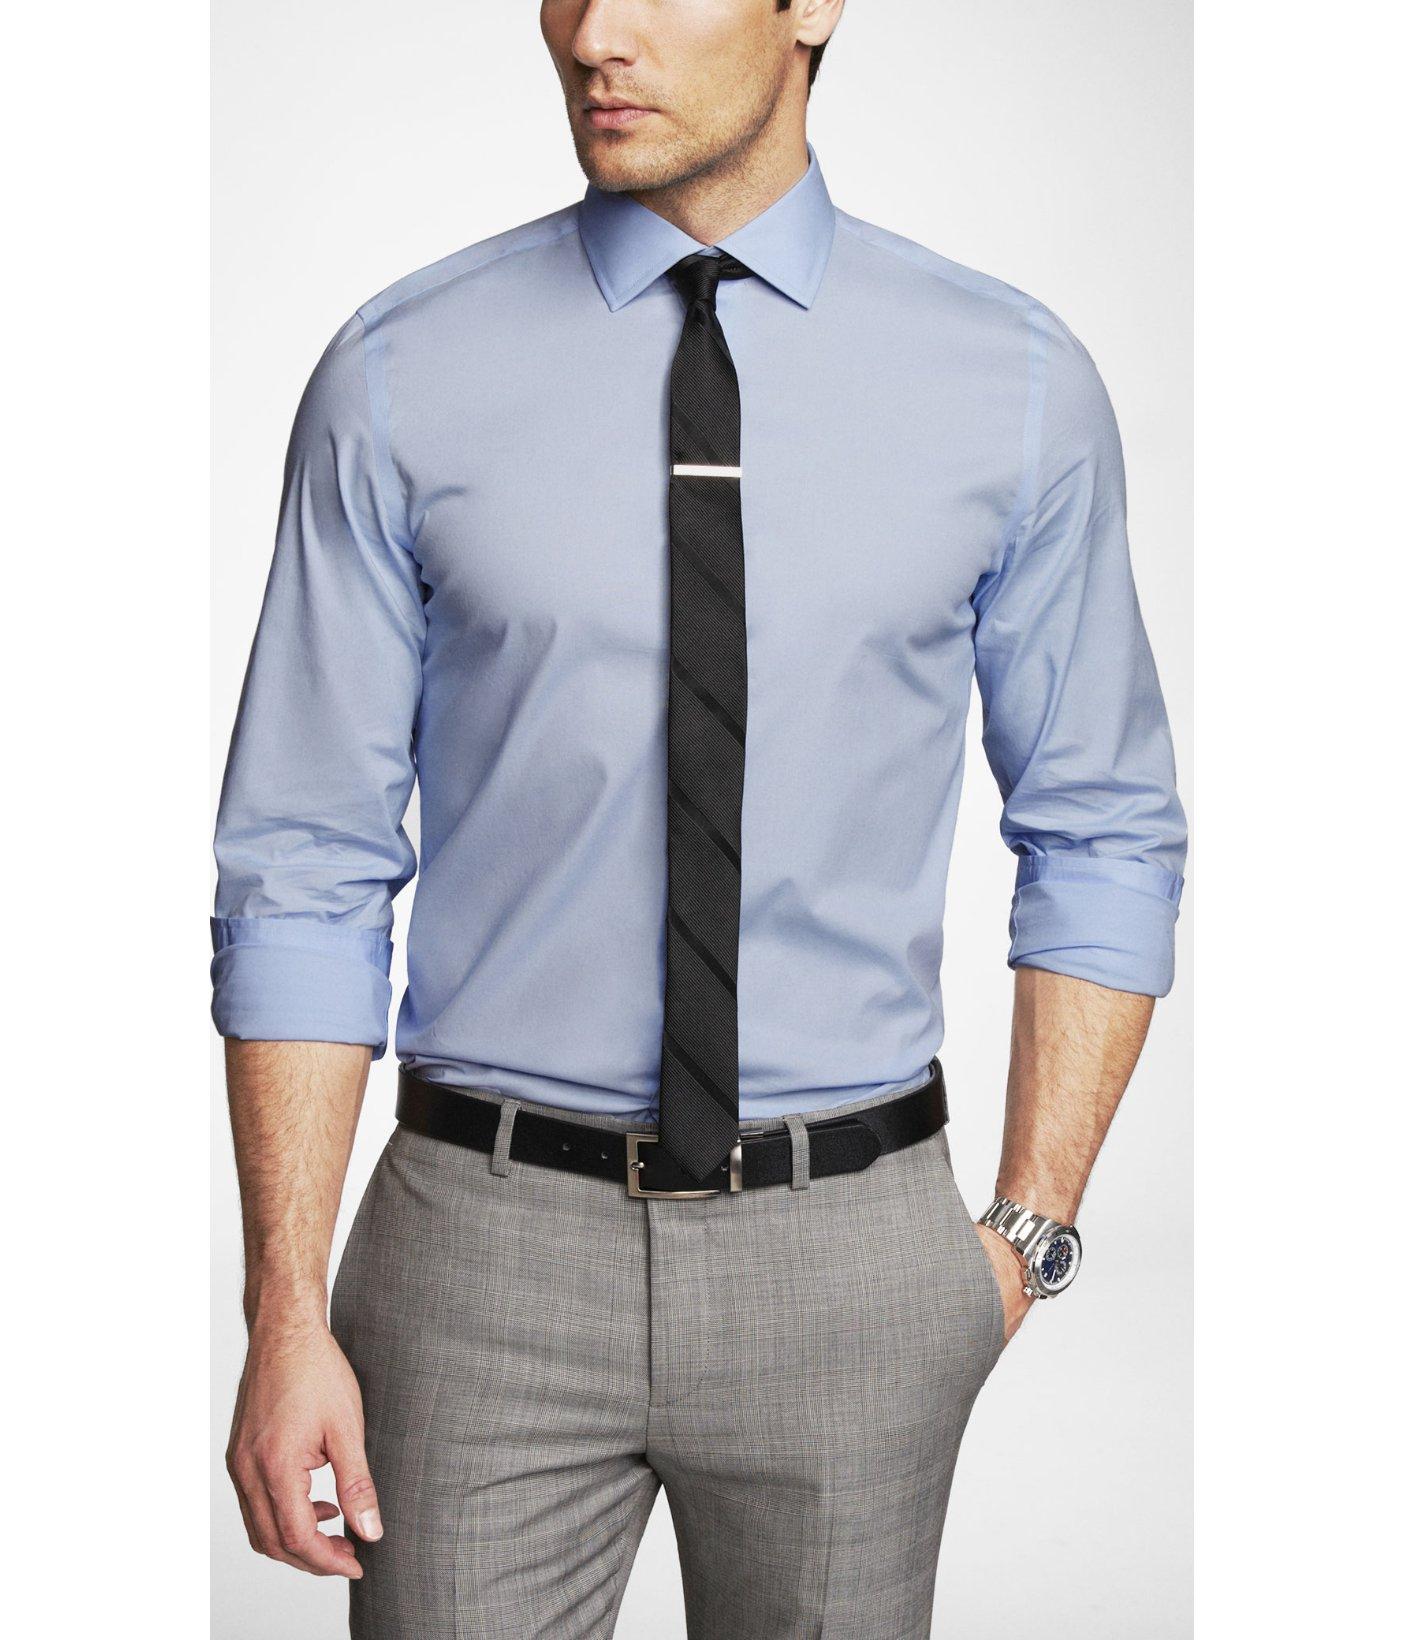 761e3c2fea Lyst - Express Modern Fit Spread Collar 1mx Shirt in Blue for Men